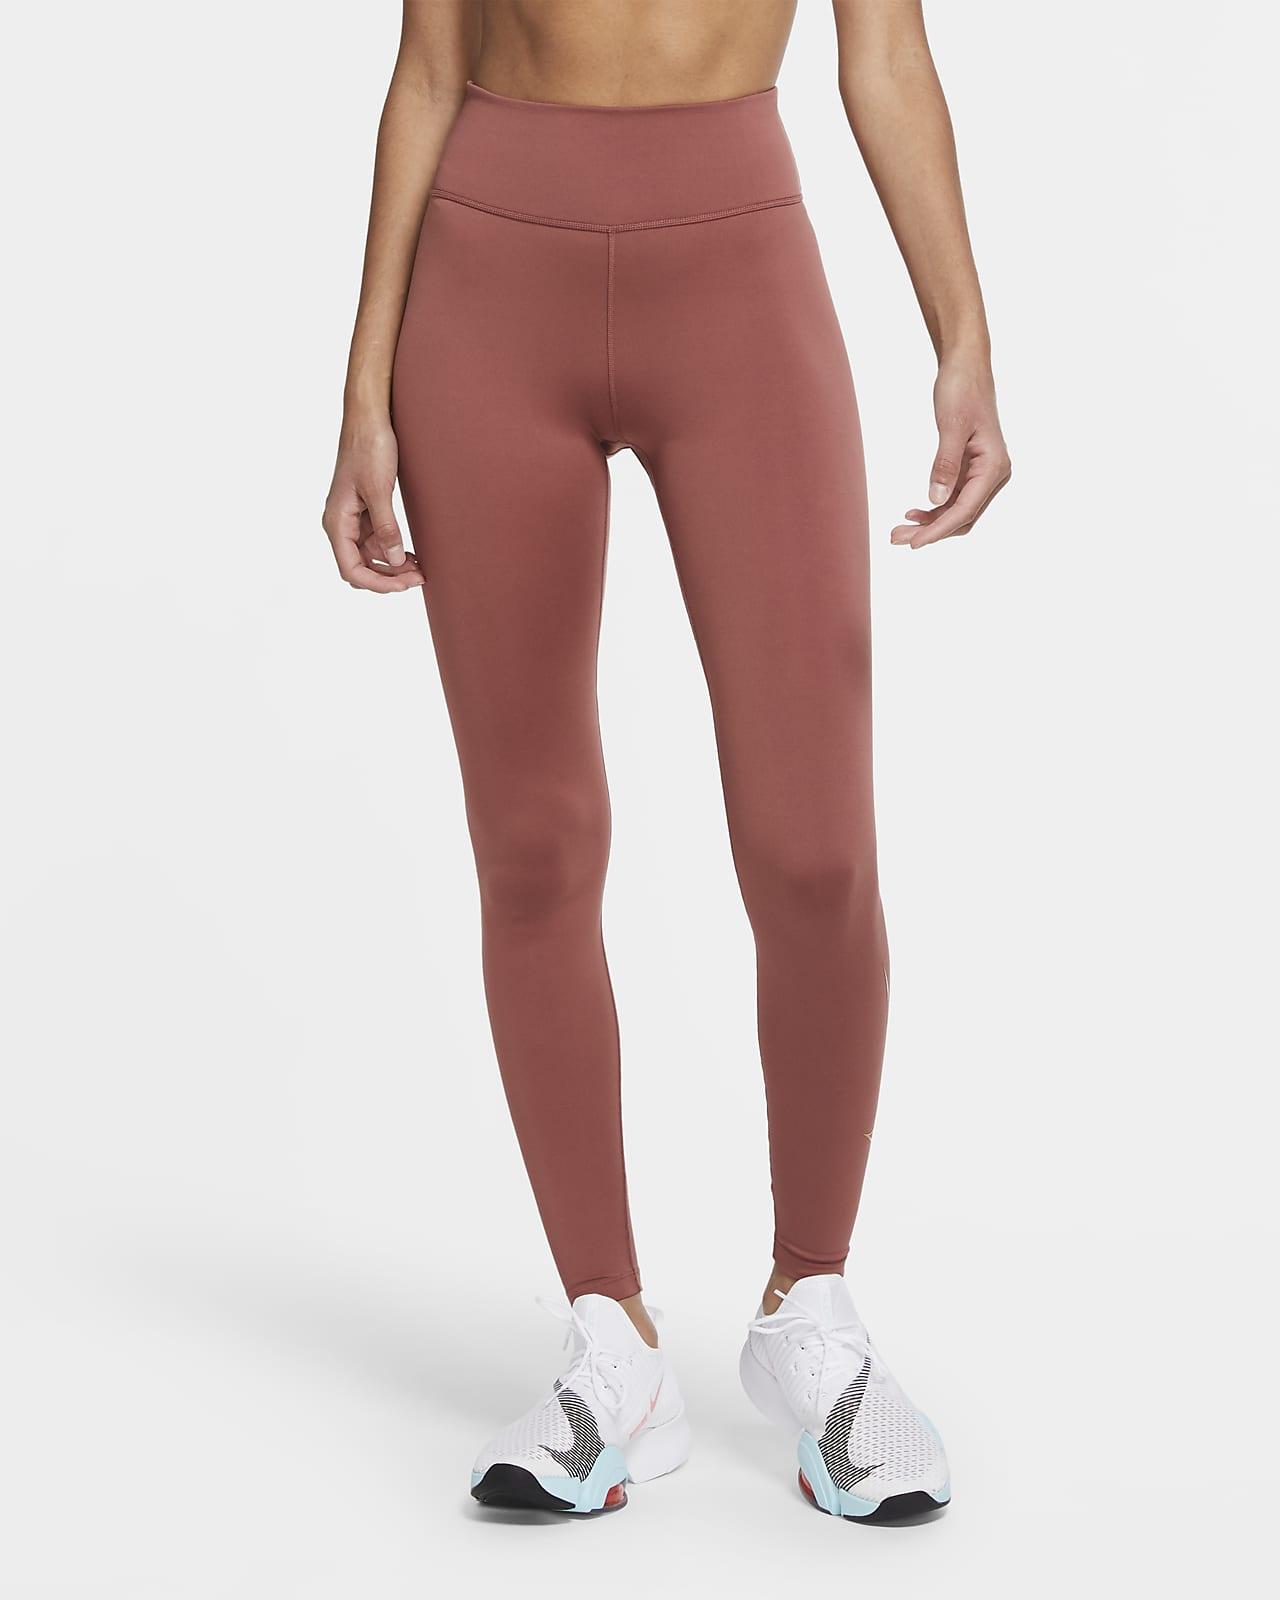 Nike One Icon Clash Women's Mid-Rise Leggings